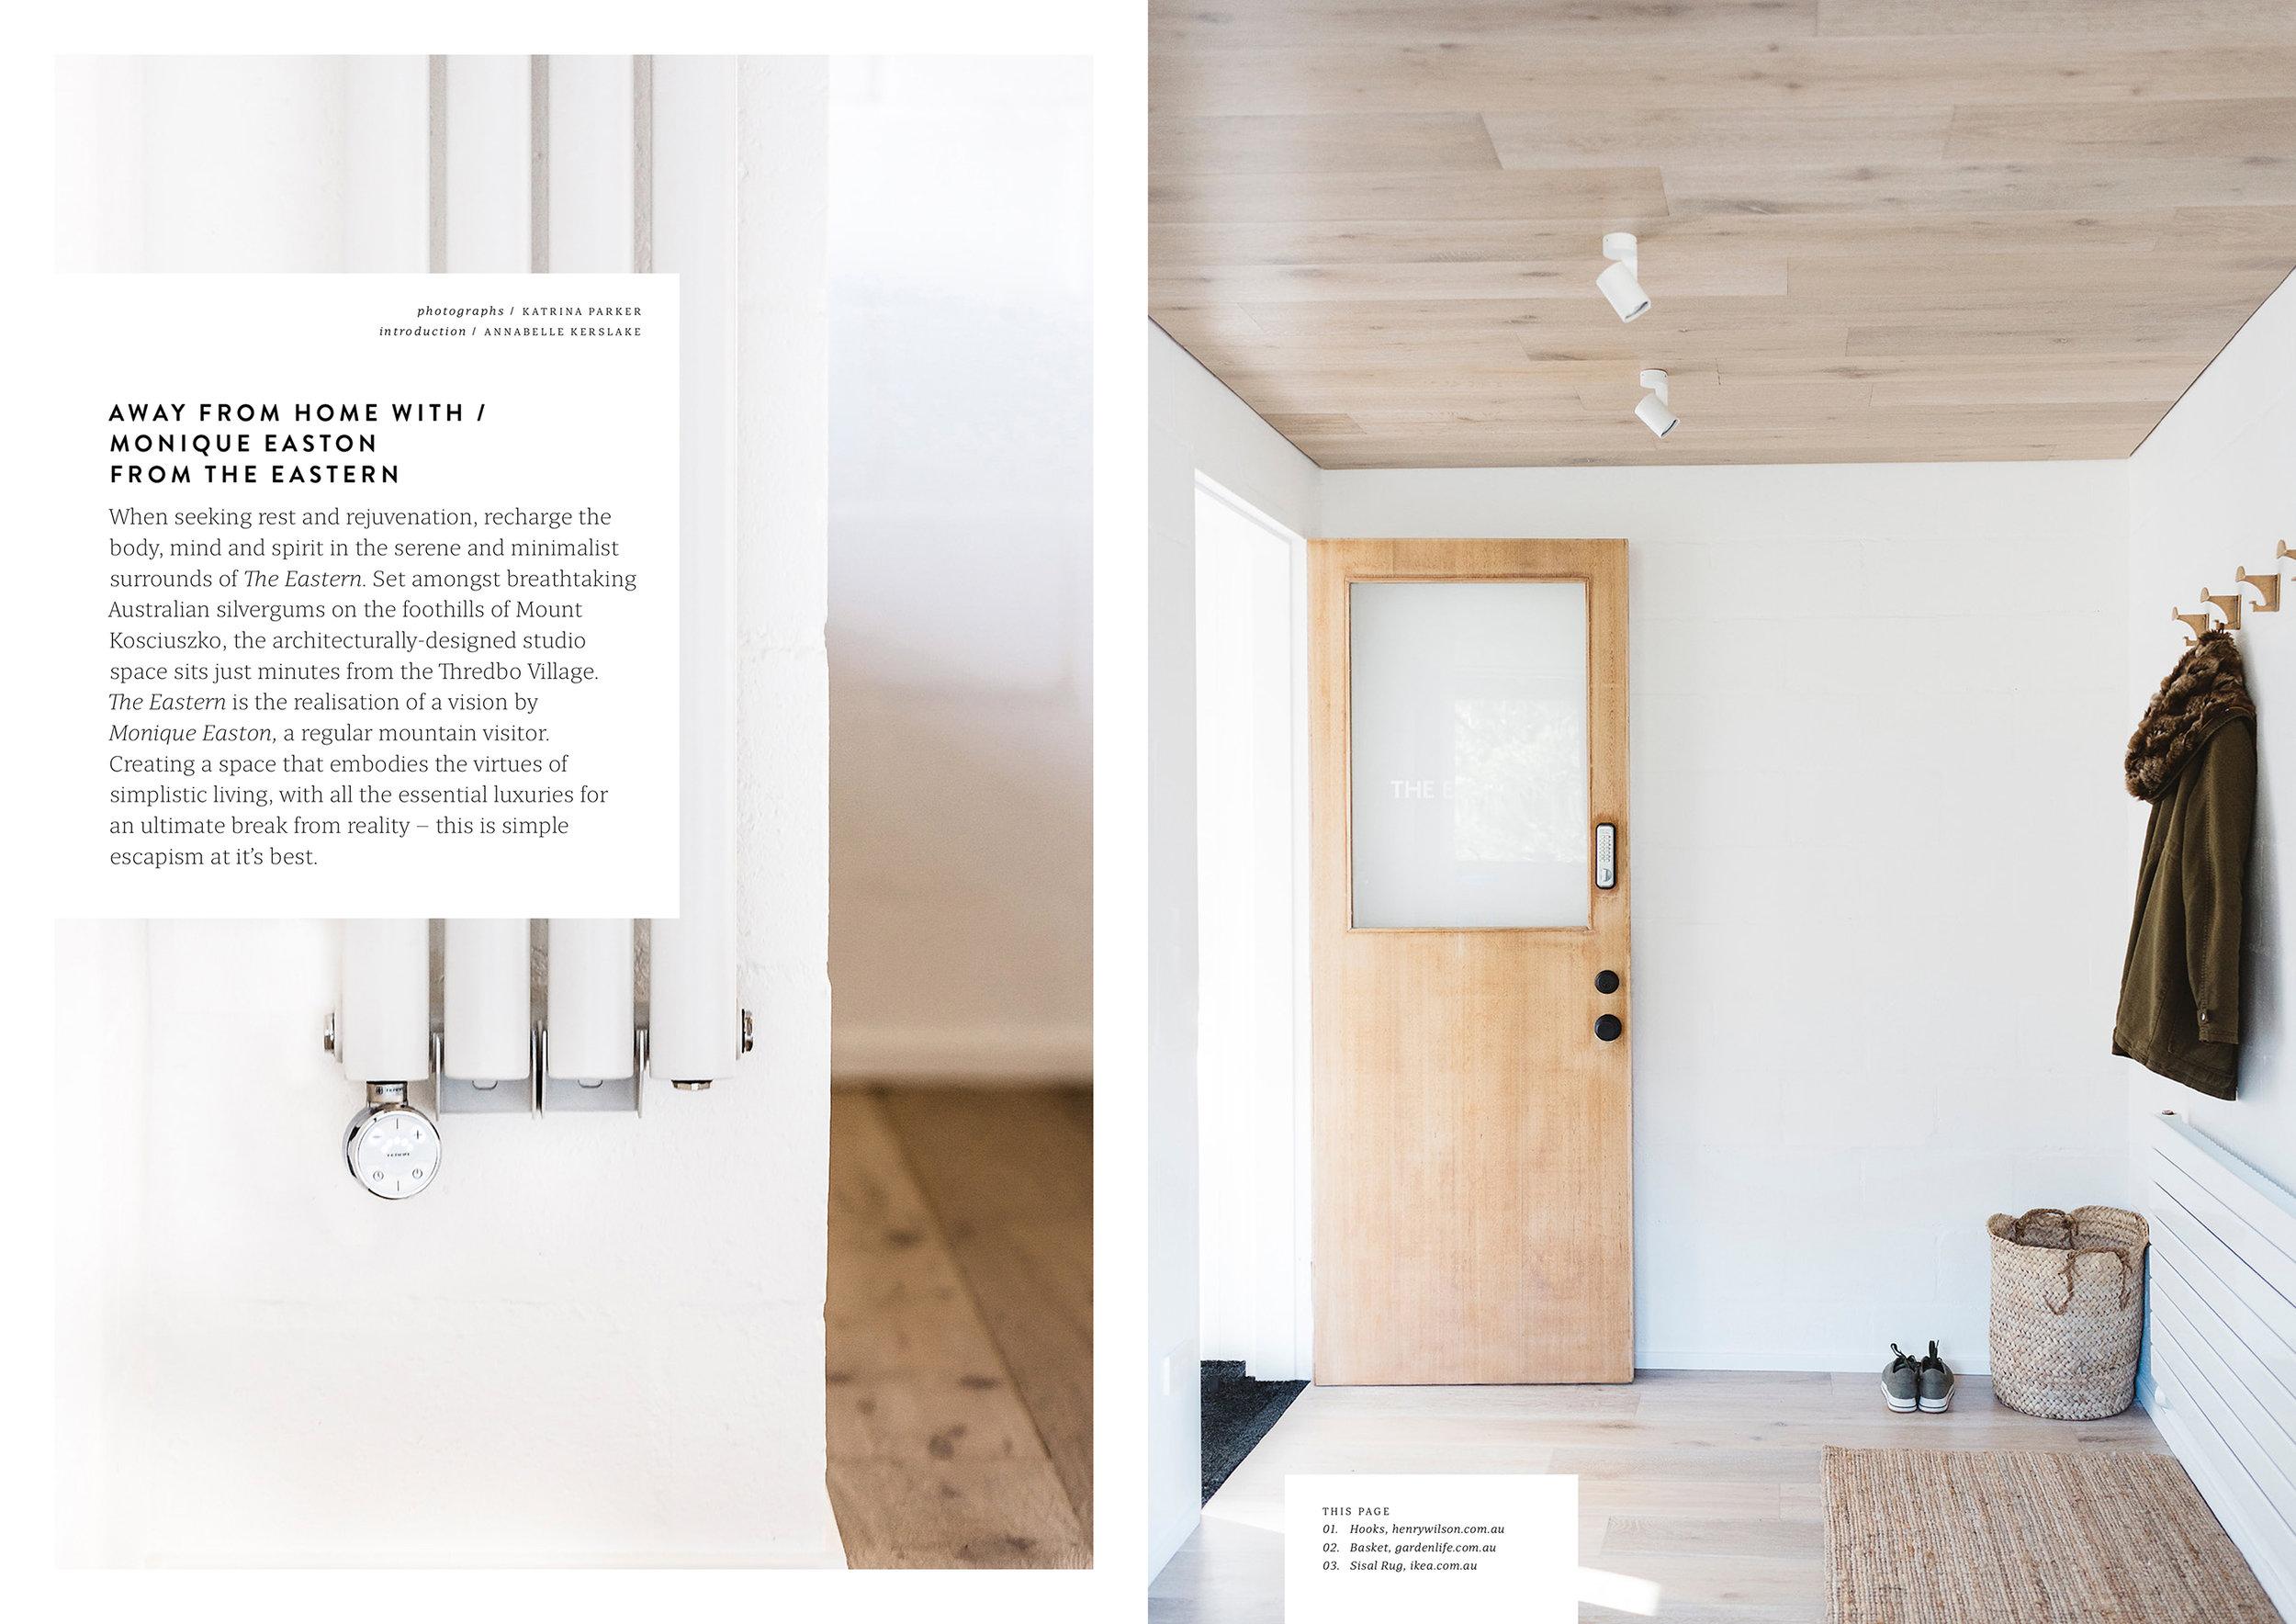 Accommodation_The_Eastern_Thredbo_Village_Fete_Magazine_001